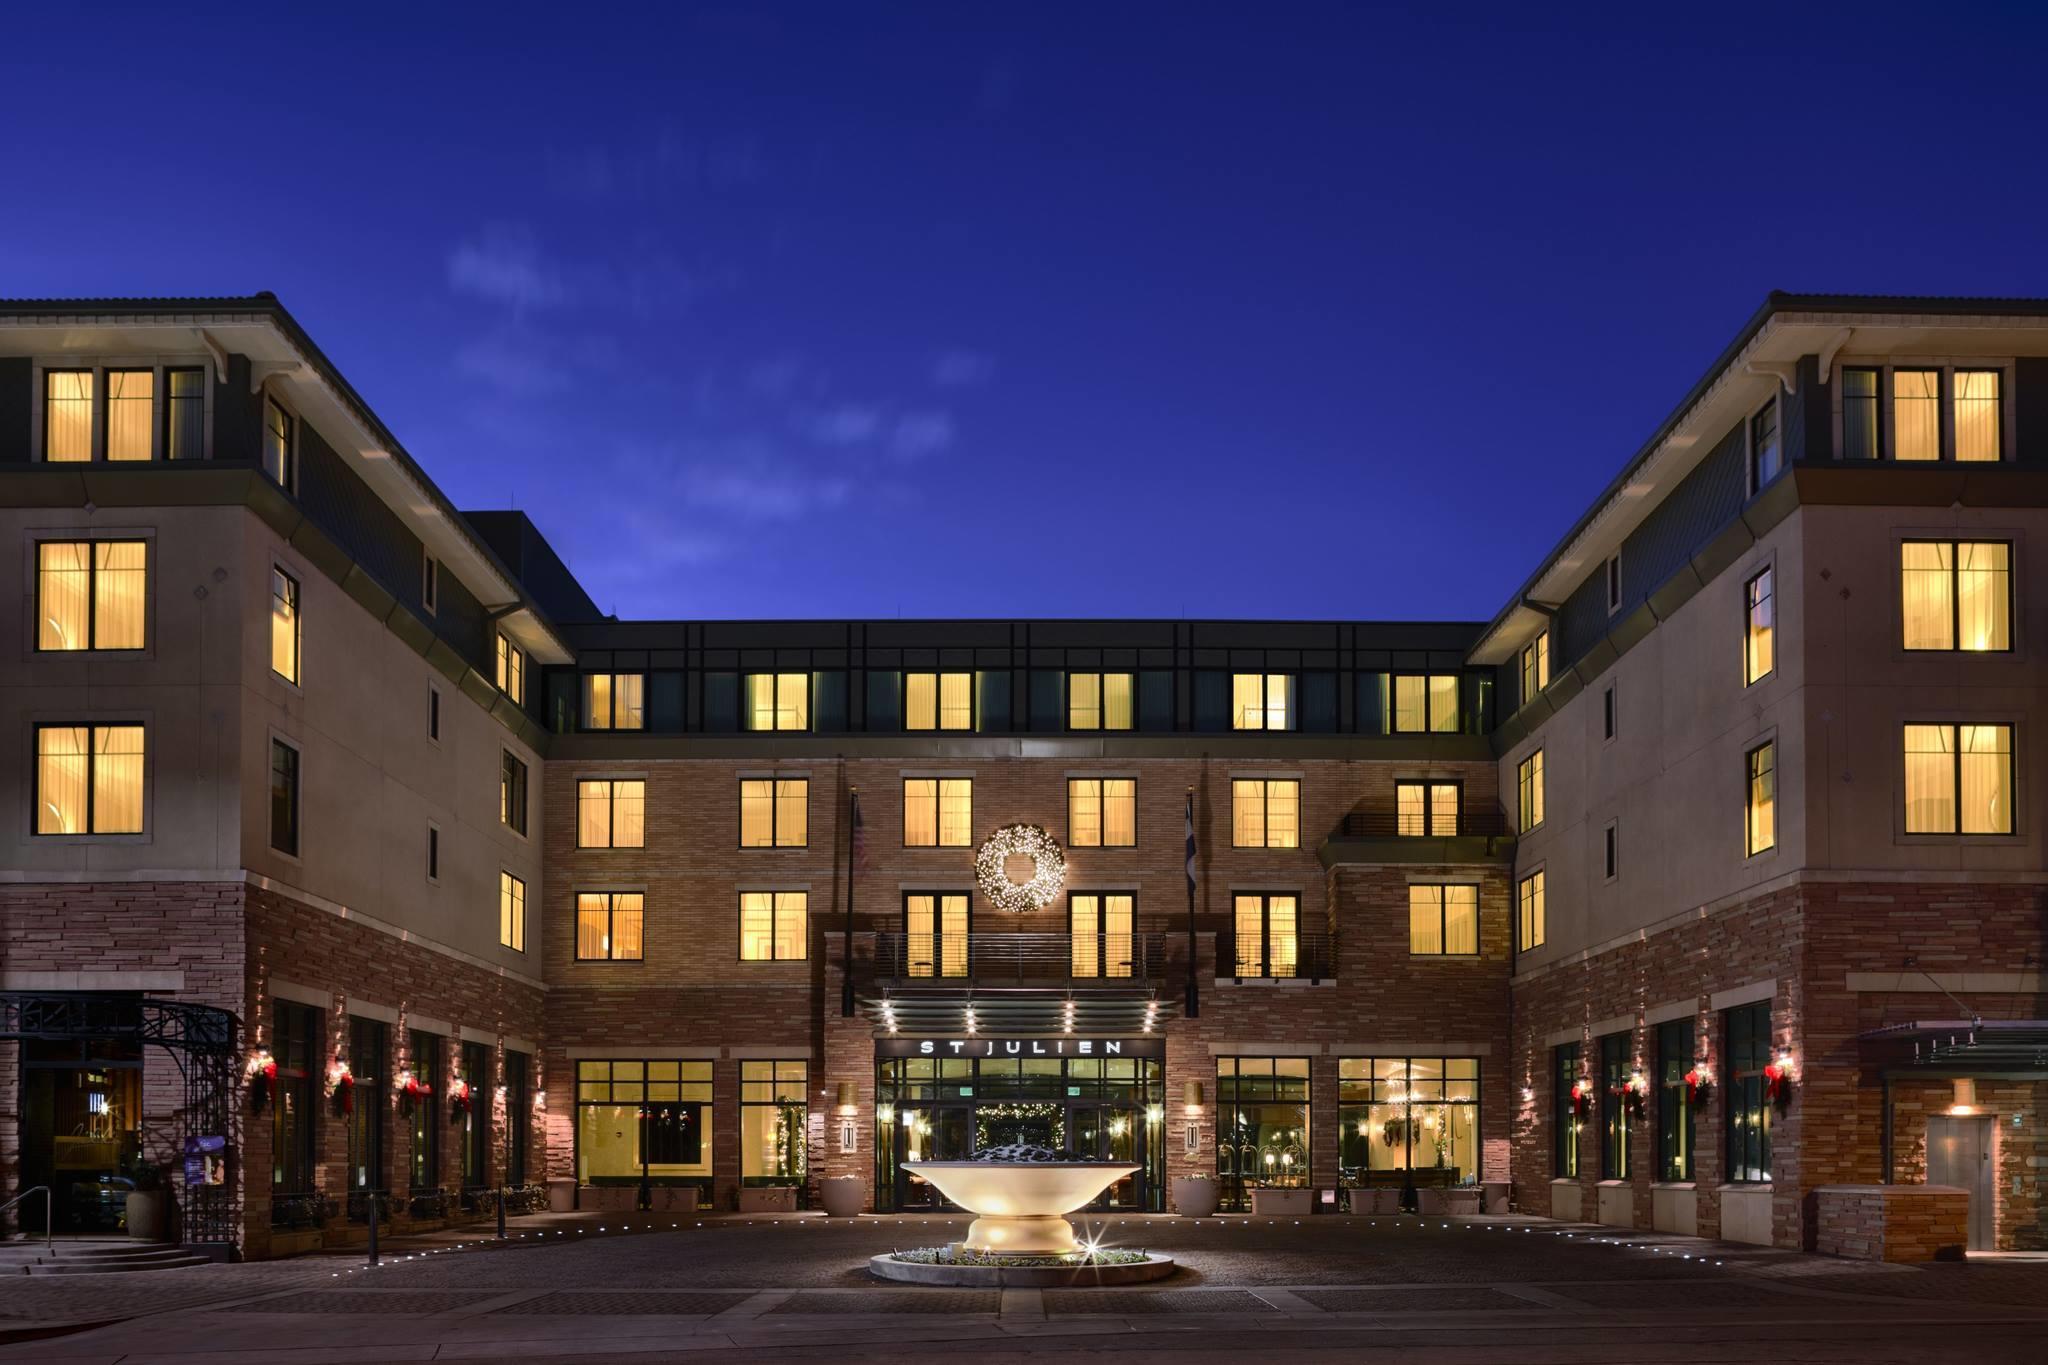 St. Julien Hotel & Spa - Exterior